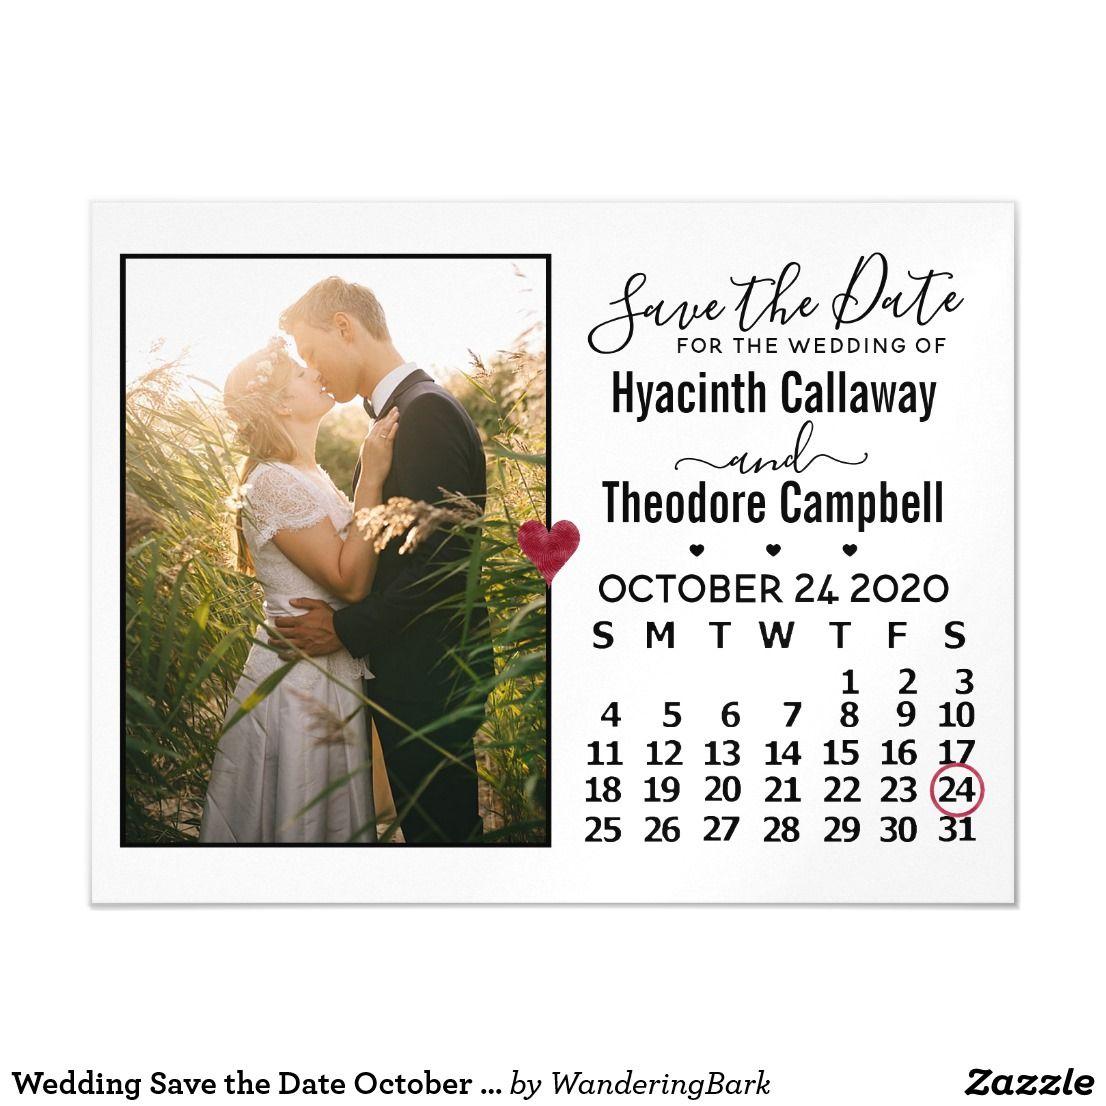 Wedding Save the Date October 2020 Calendar Photo